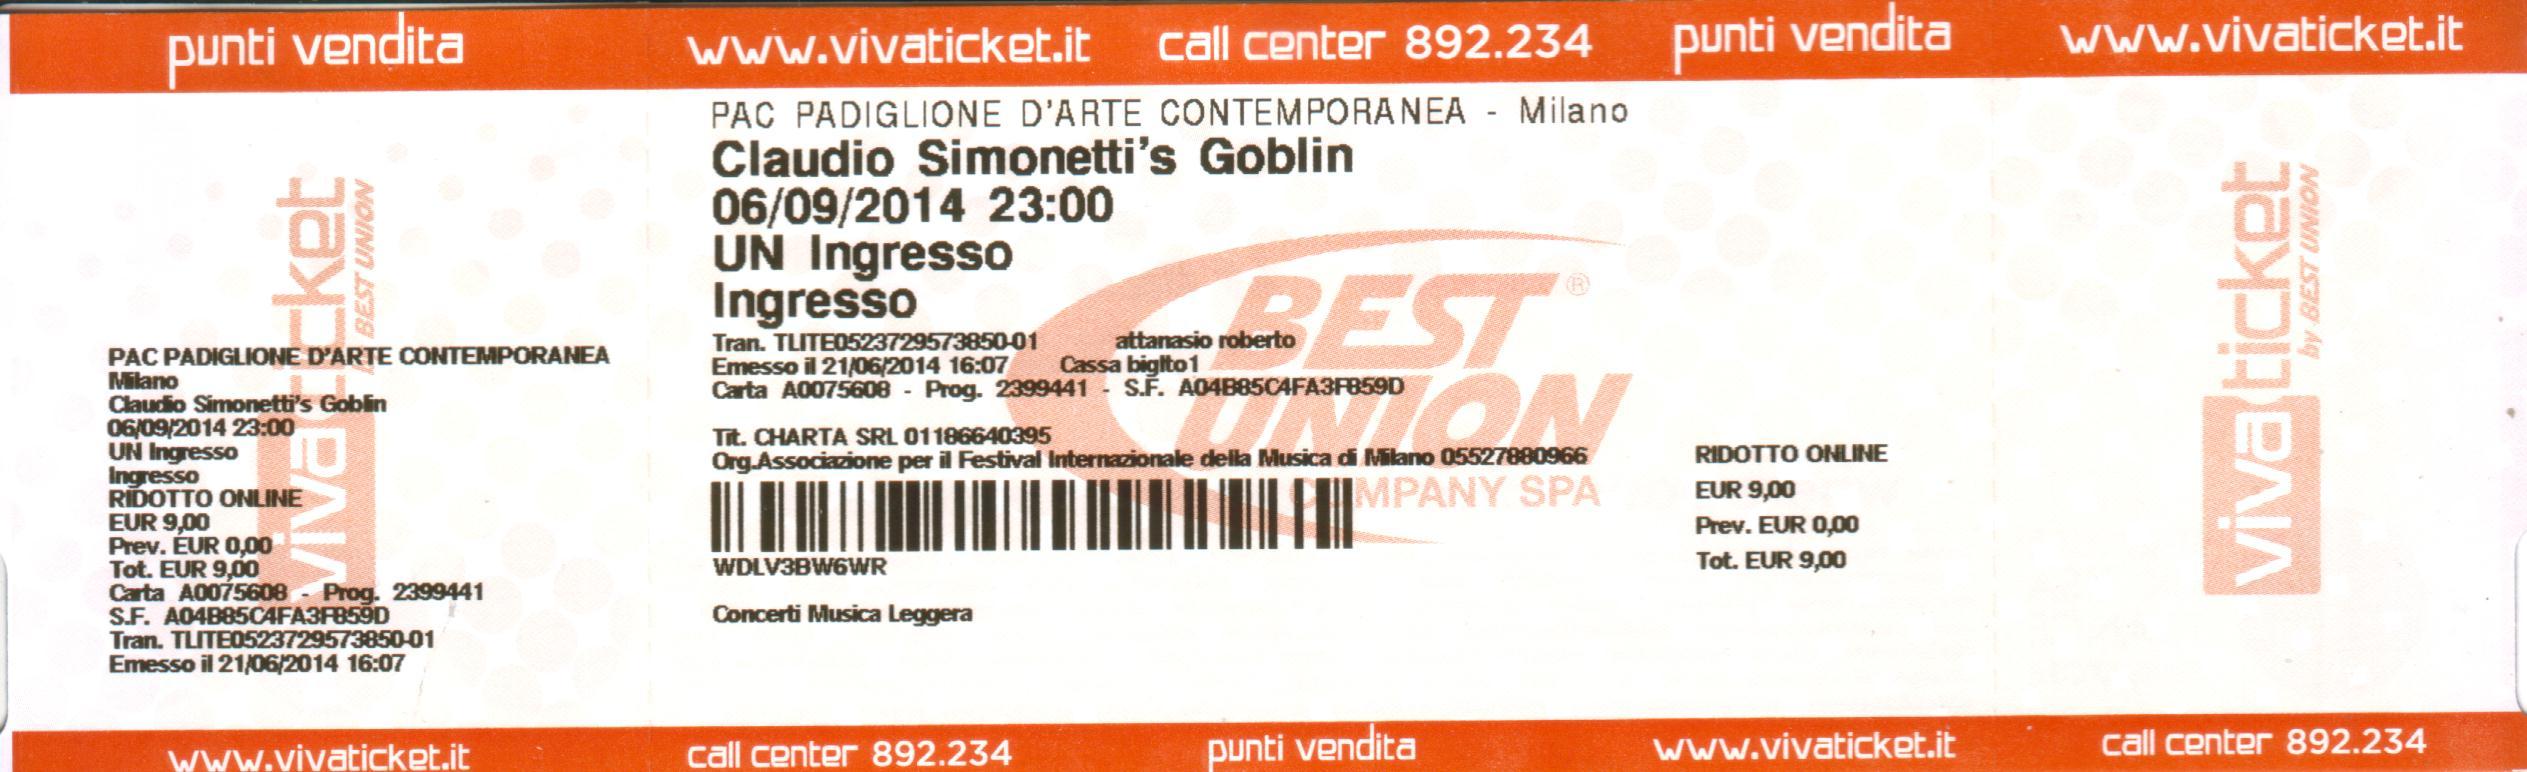 Claudio Simonetti's Goblin